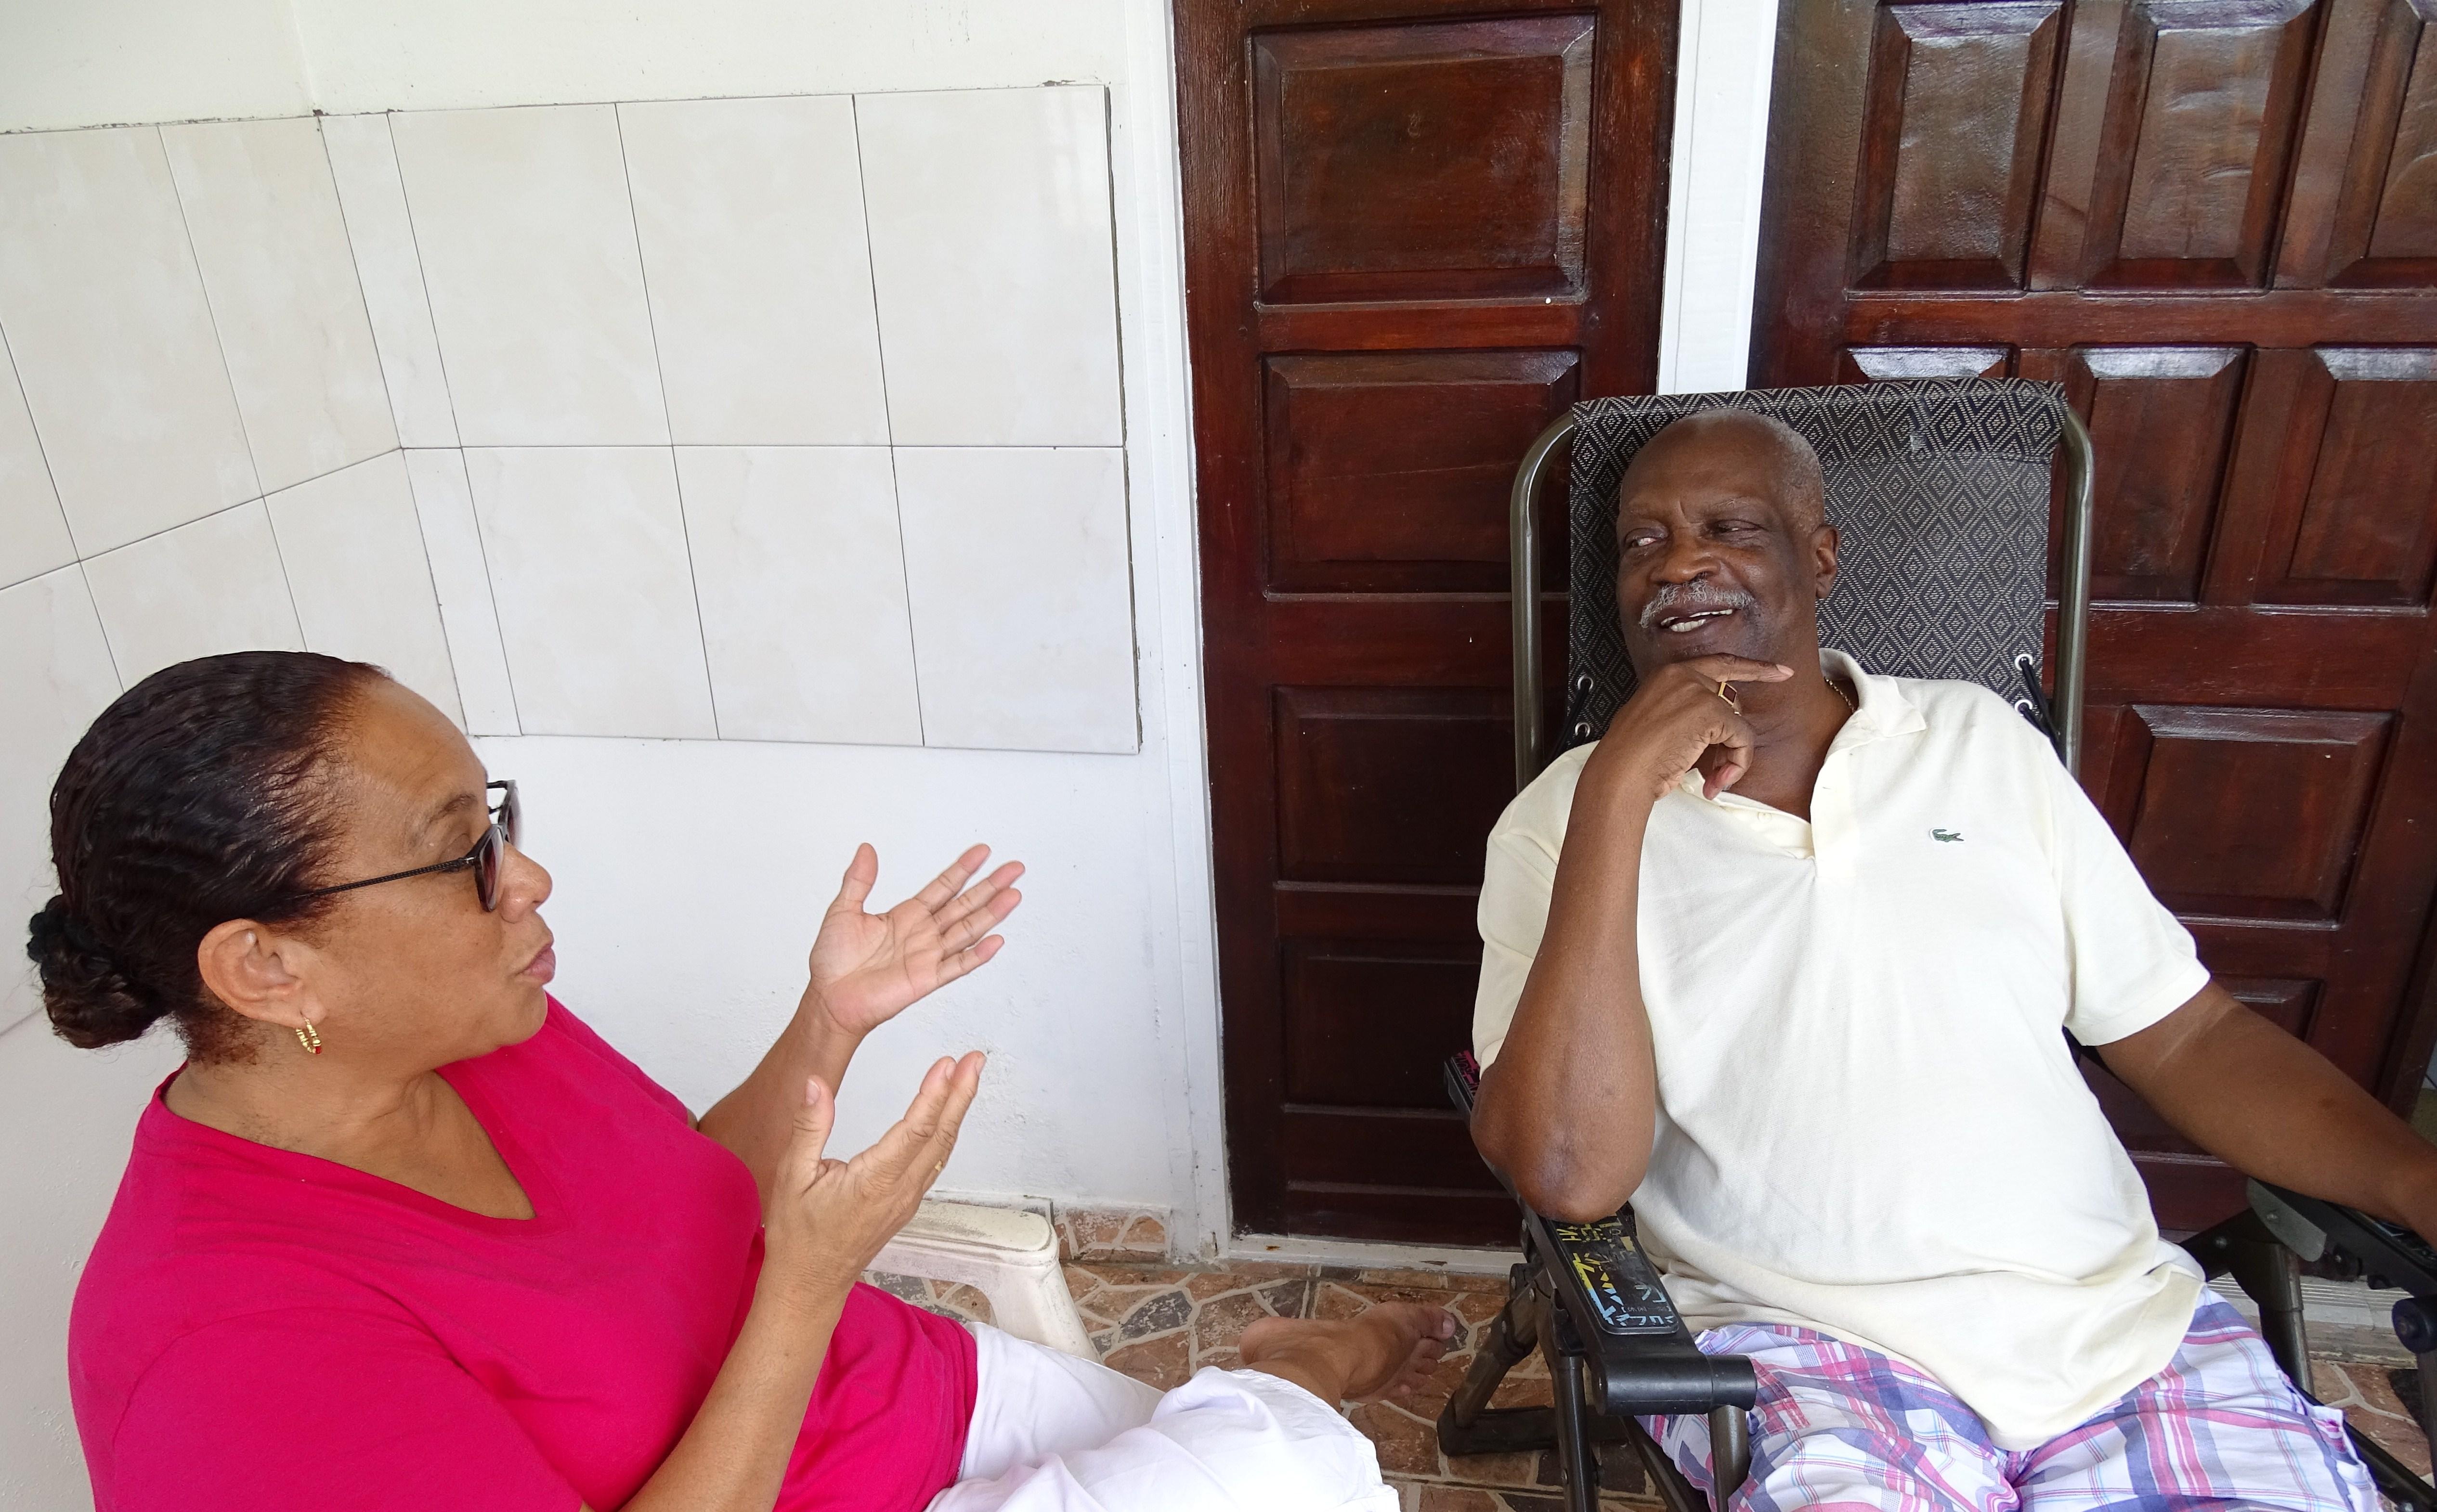 mw Carla Bakboord interviewt dhr Franklin M Pinas, Statenlid en rechterhand van premier Johan Adolf Pengel (Suriname)